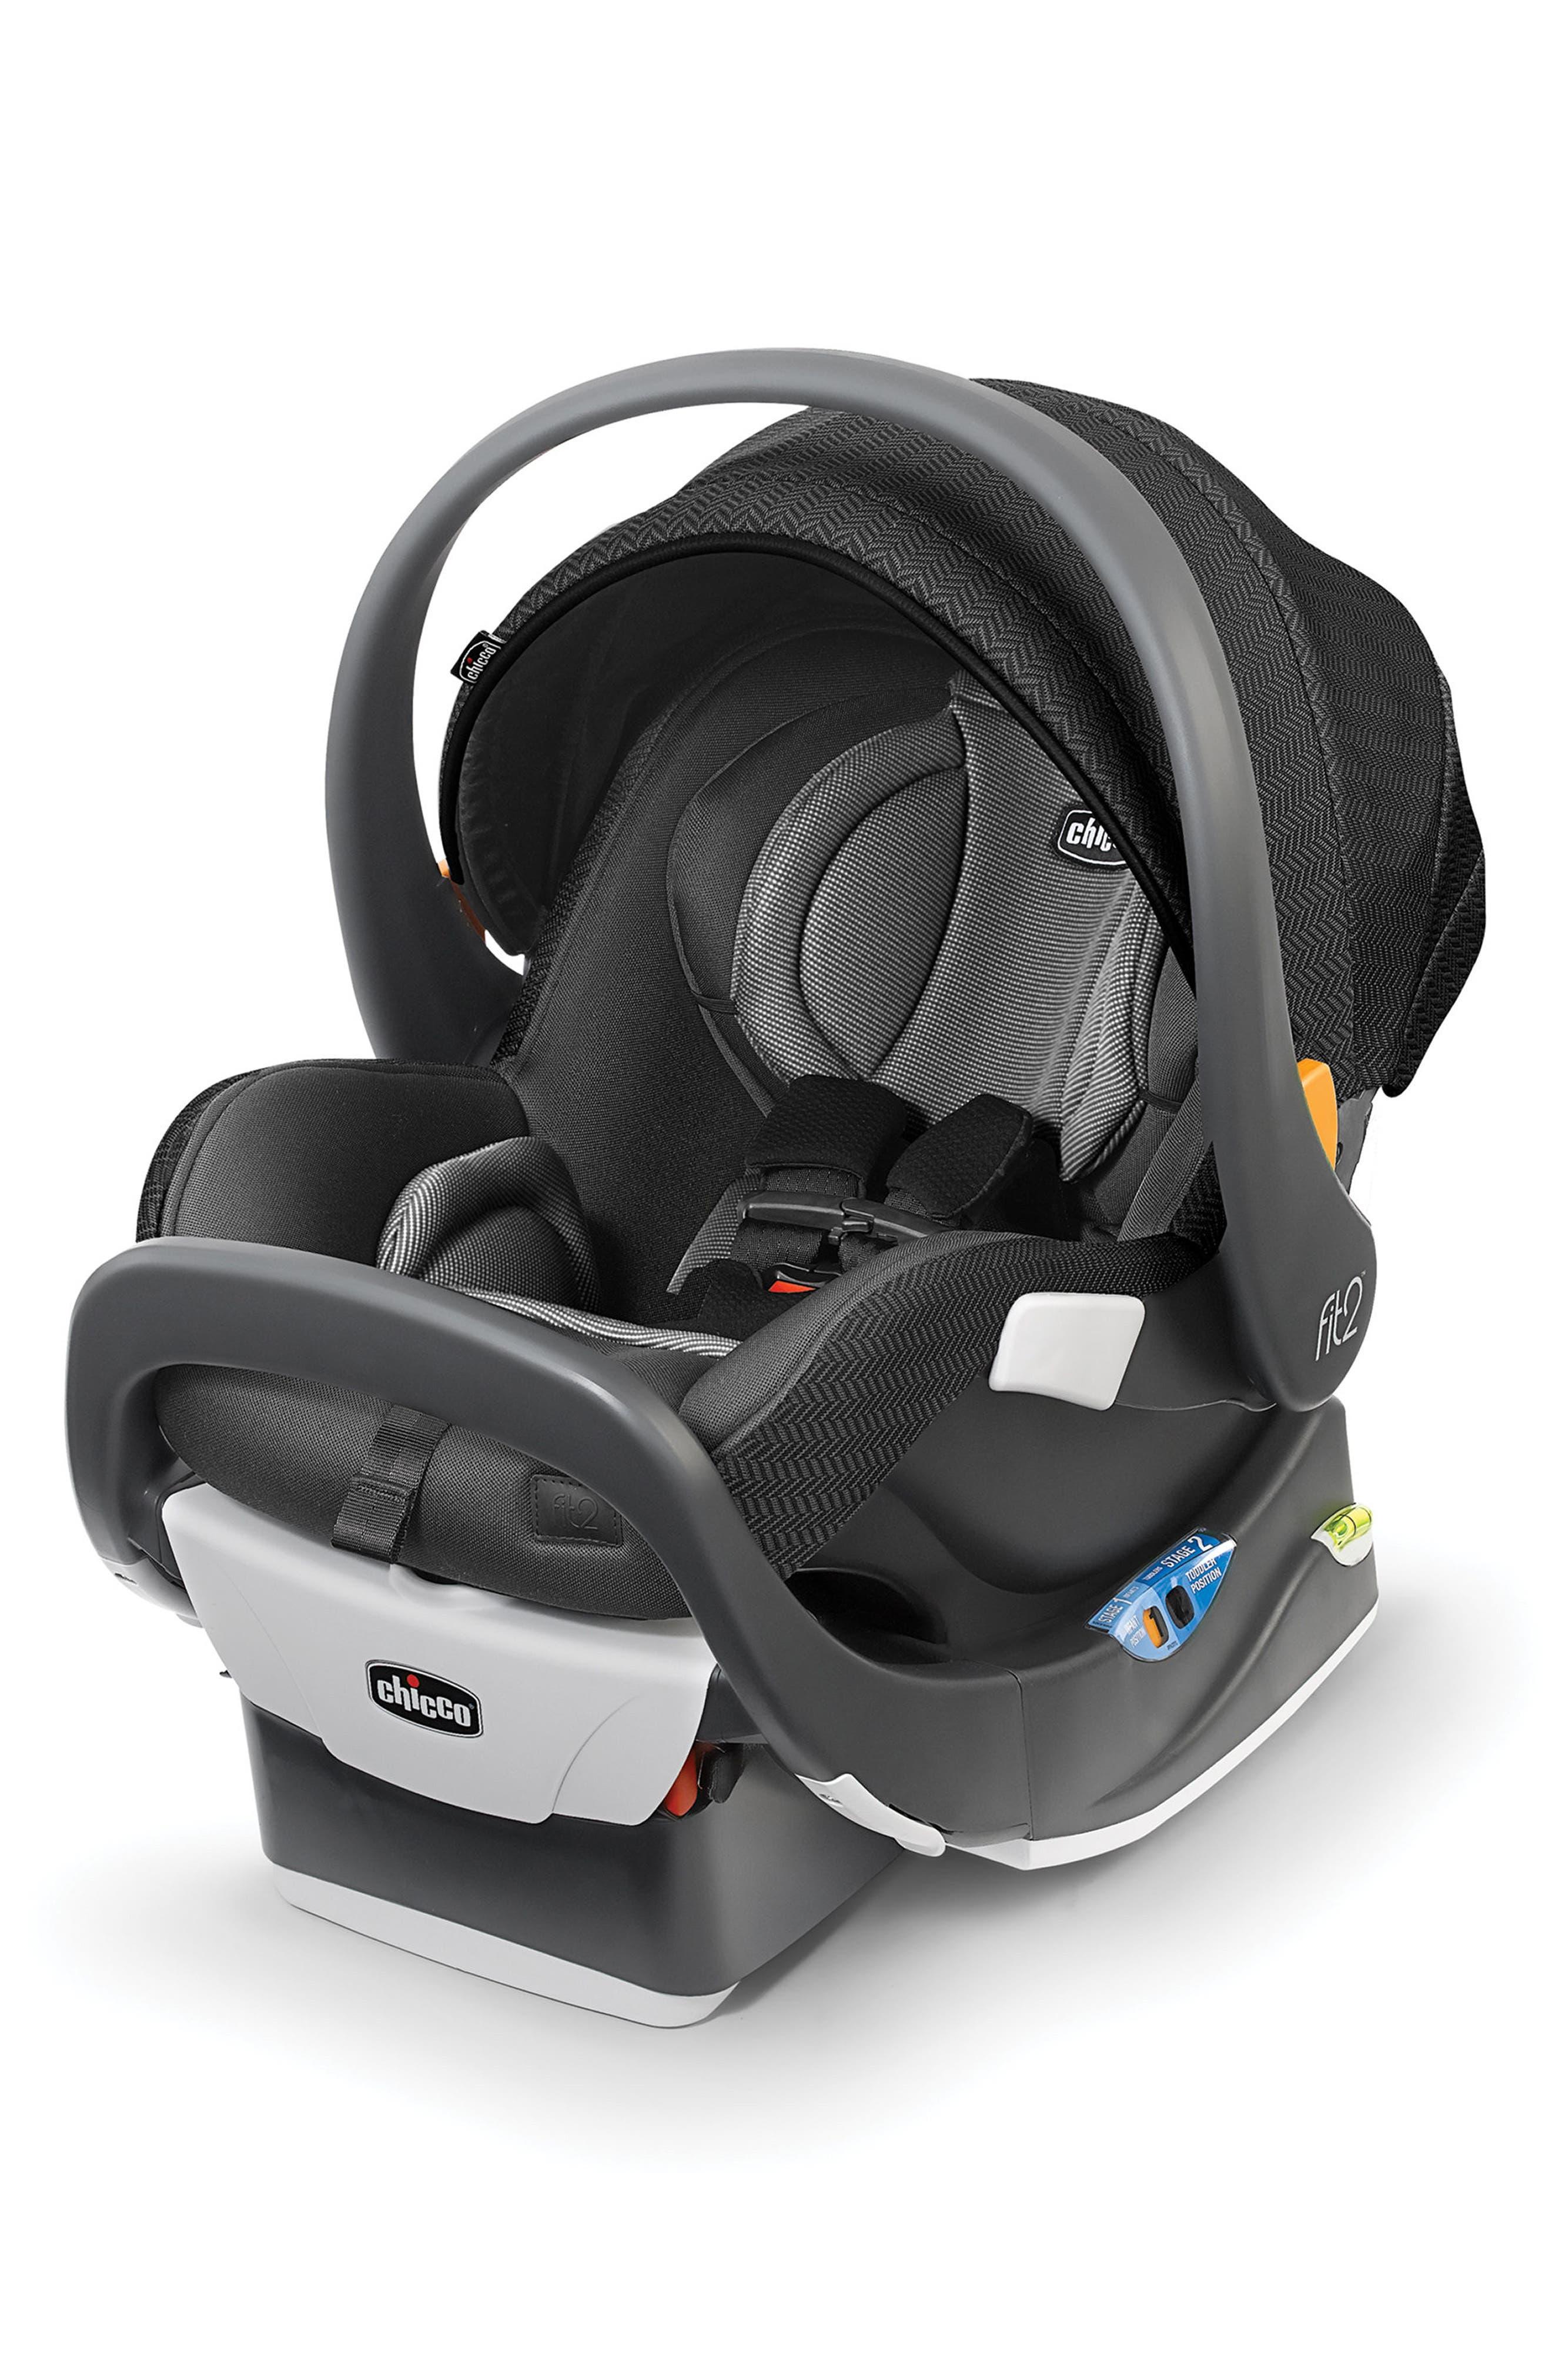 Fit2 2018 Rear-Facing Infant & Toddler Car Seat,                             Main thumbnail 1, color,                             001